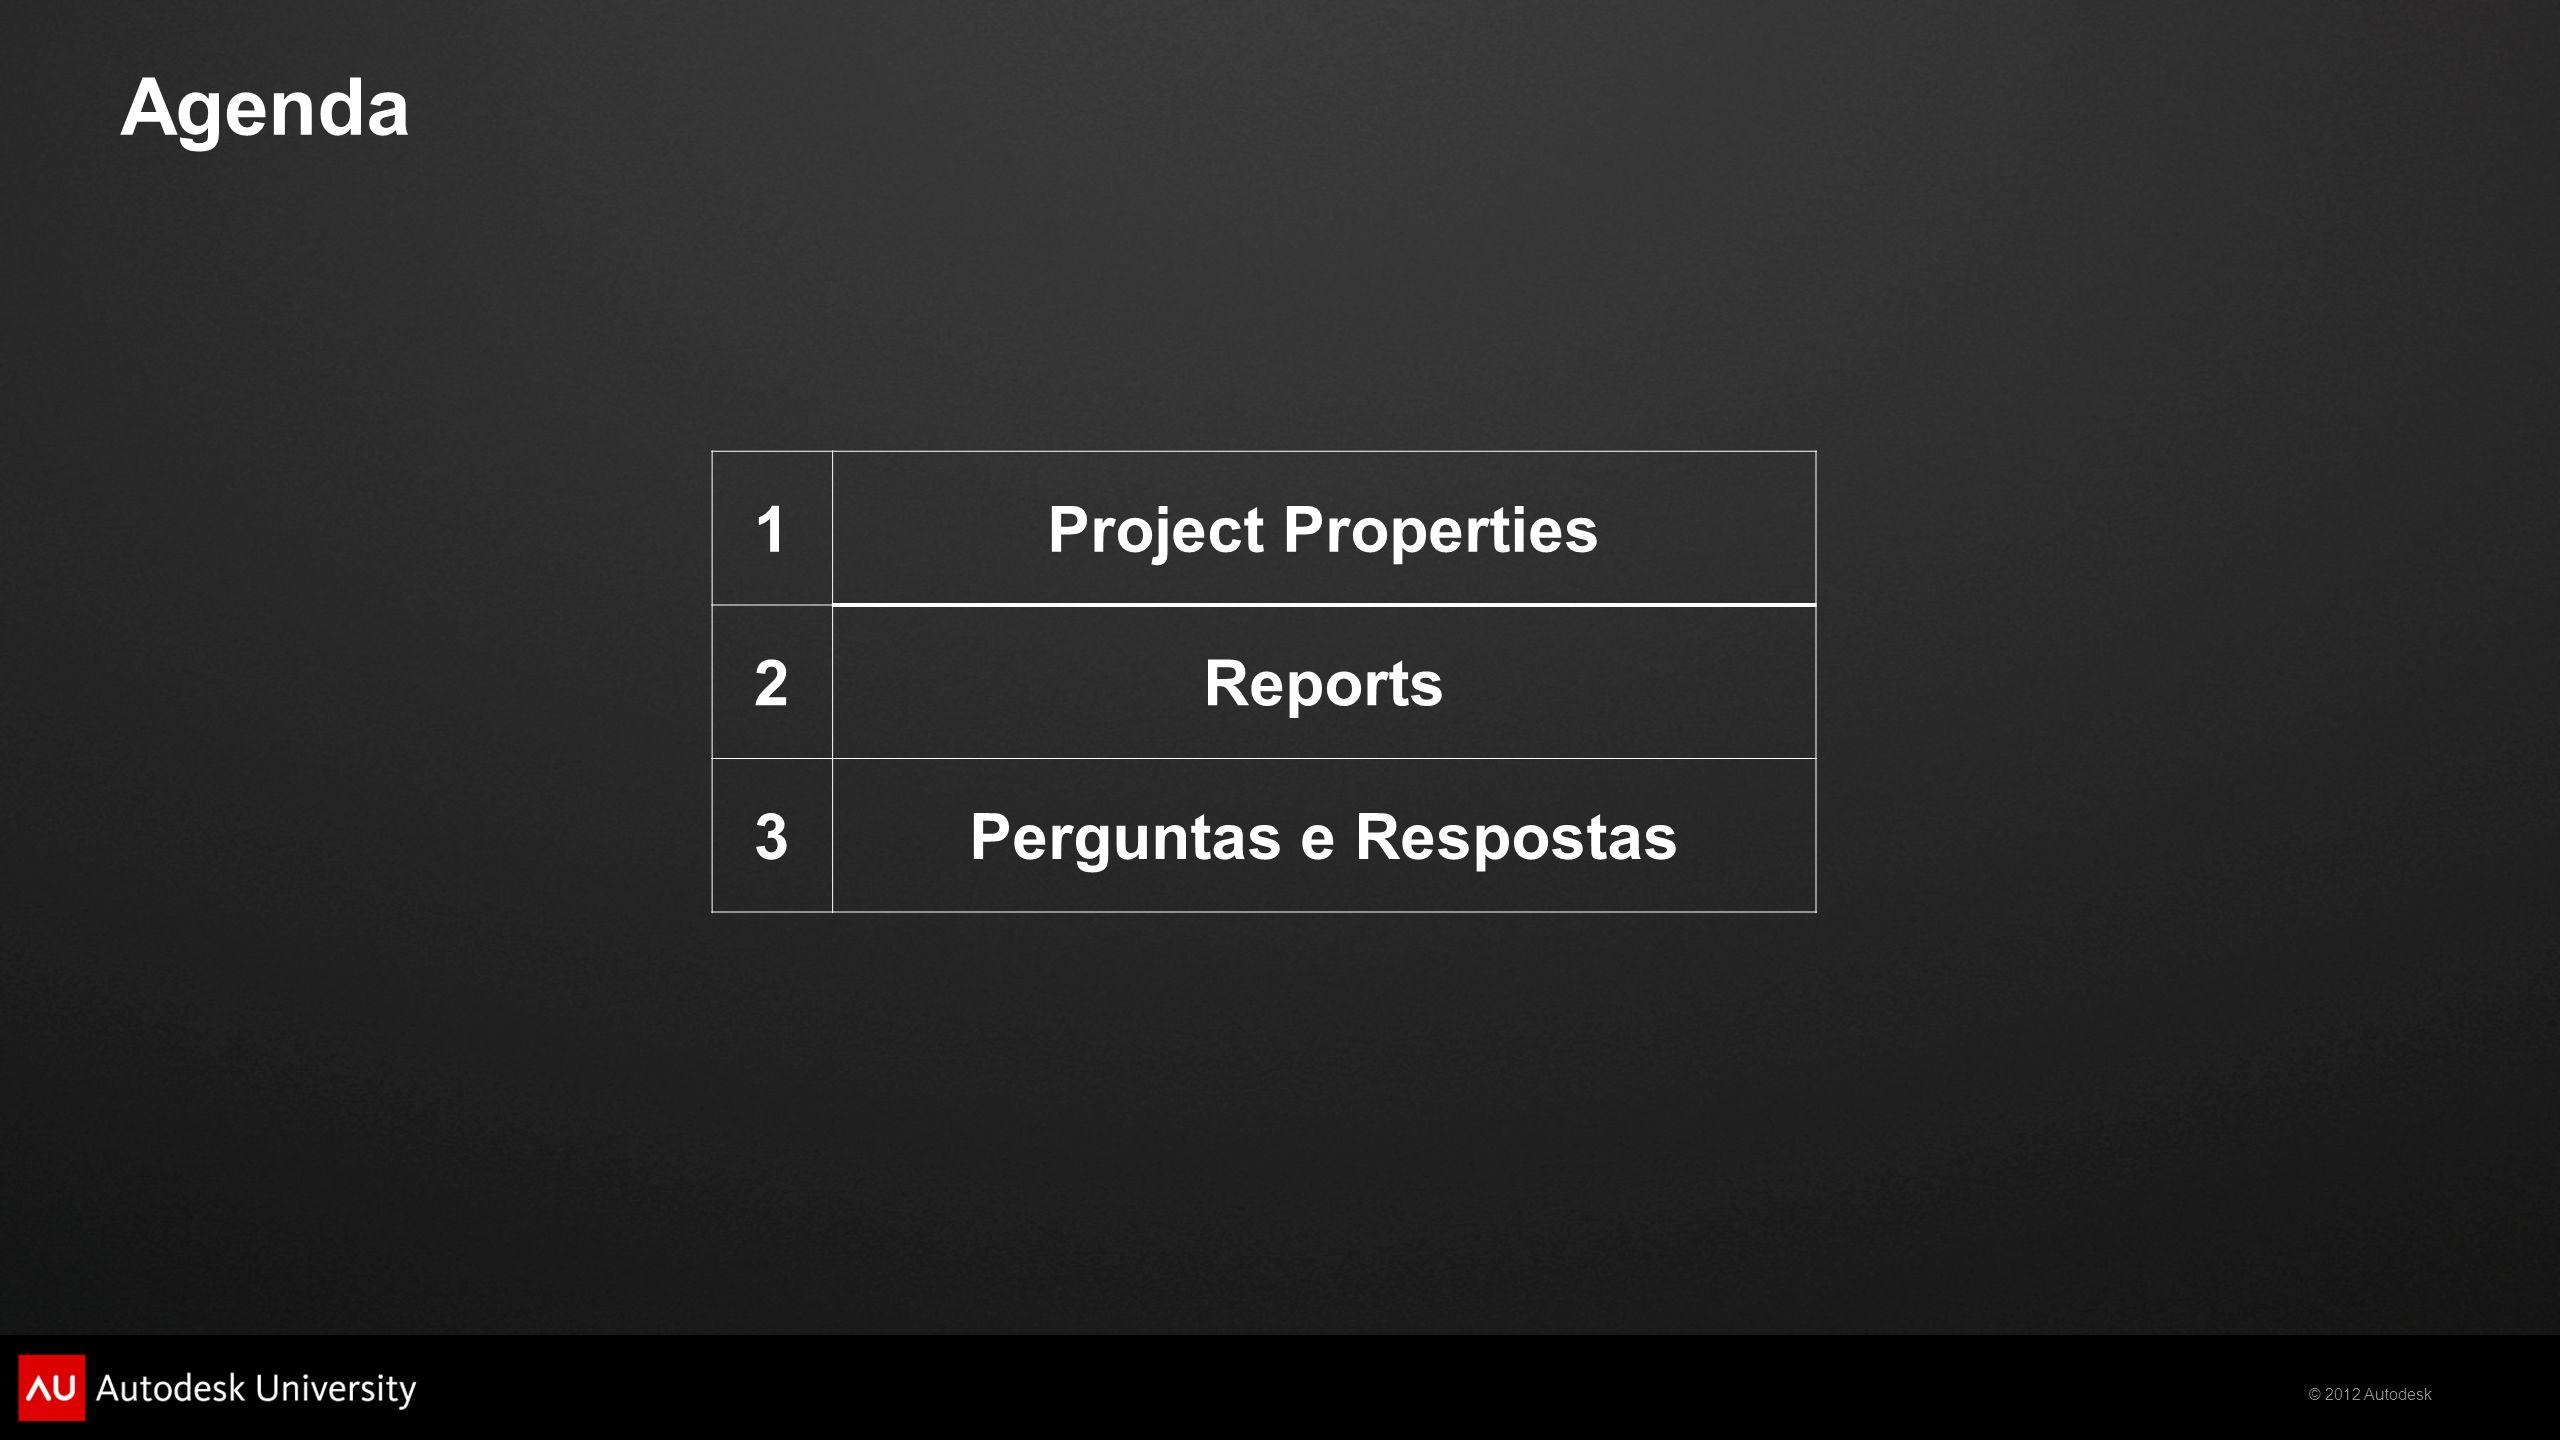 Agenda 1 Project Properties 2 Reports 3 Perguntas e Respostas